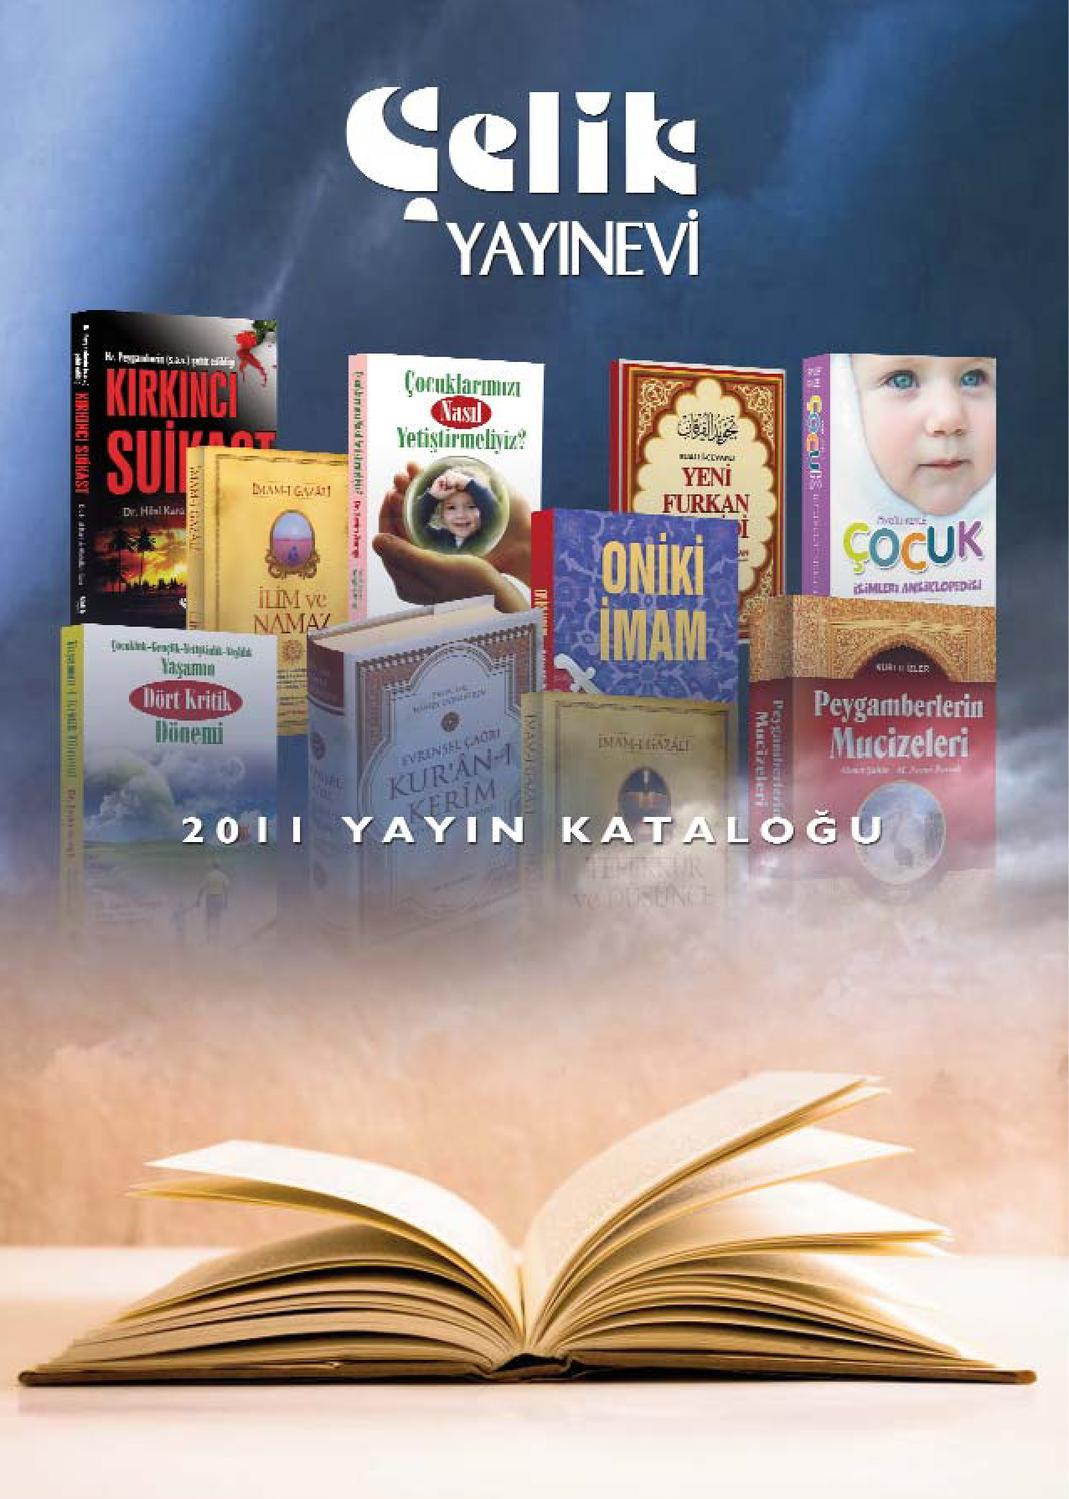 Celik Yayinevi 2011 Katalogu By Emrullah Tastan Issuu